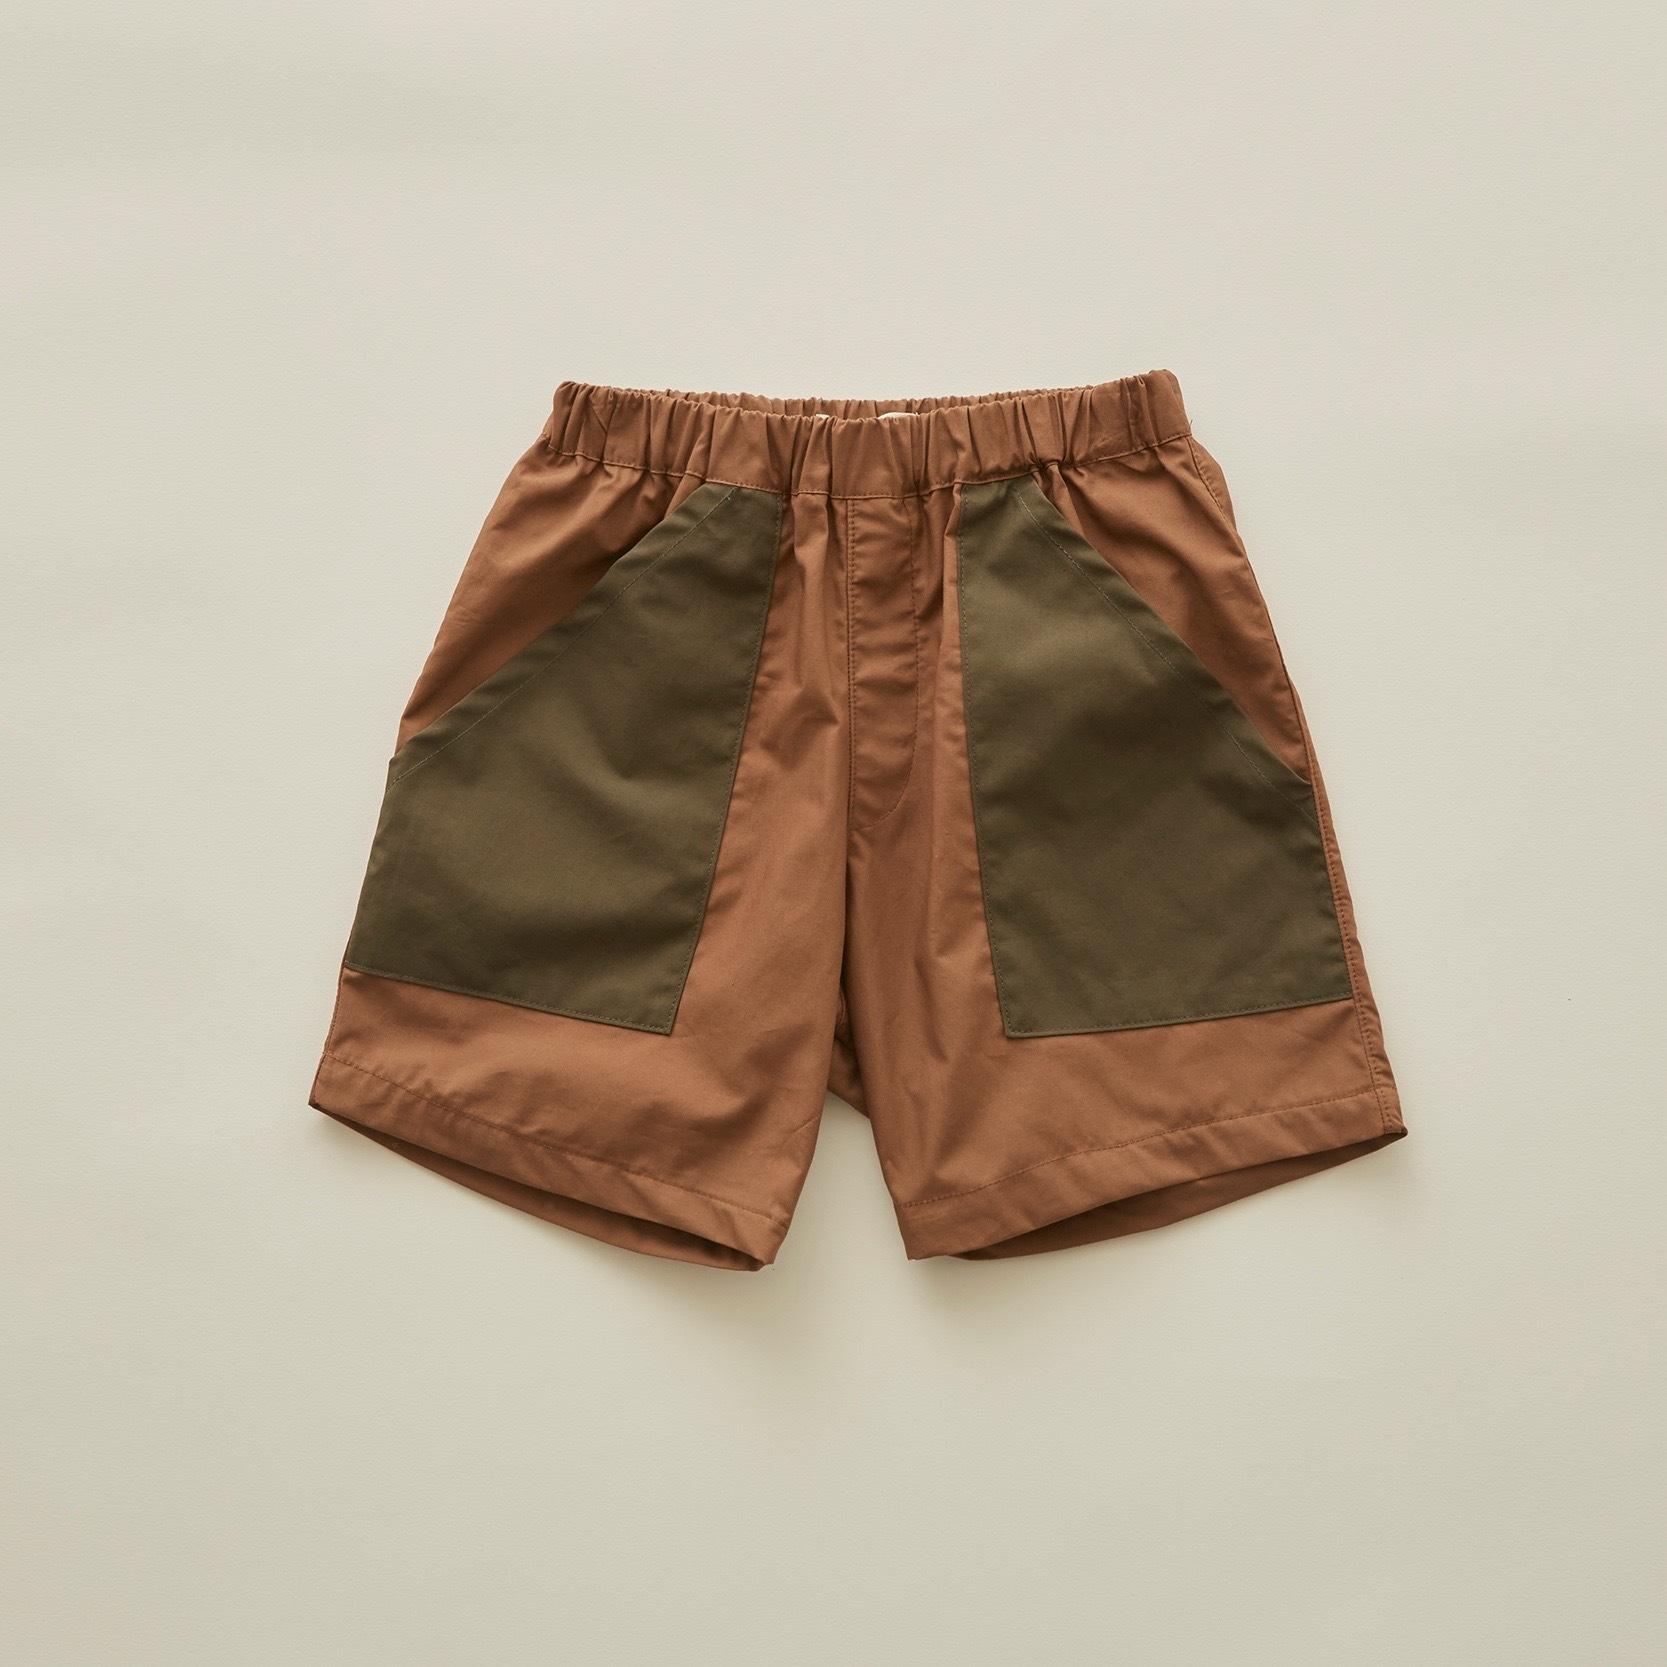 《eLfinFolk 2020SS》typwriter shorts / cocoa / 140・150cm